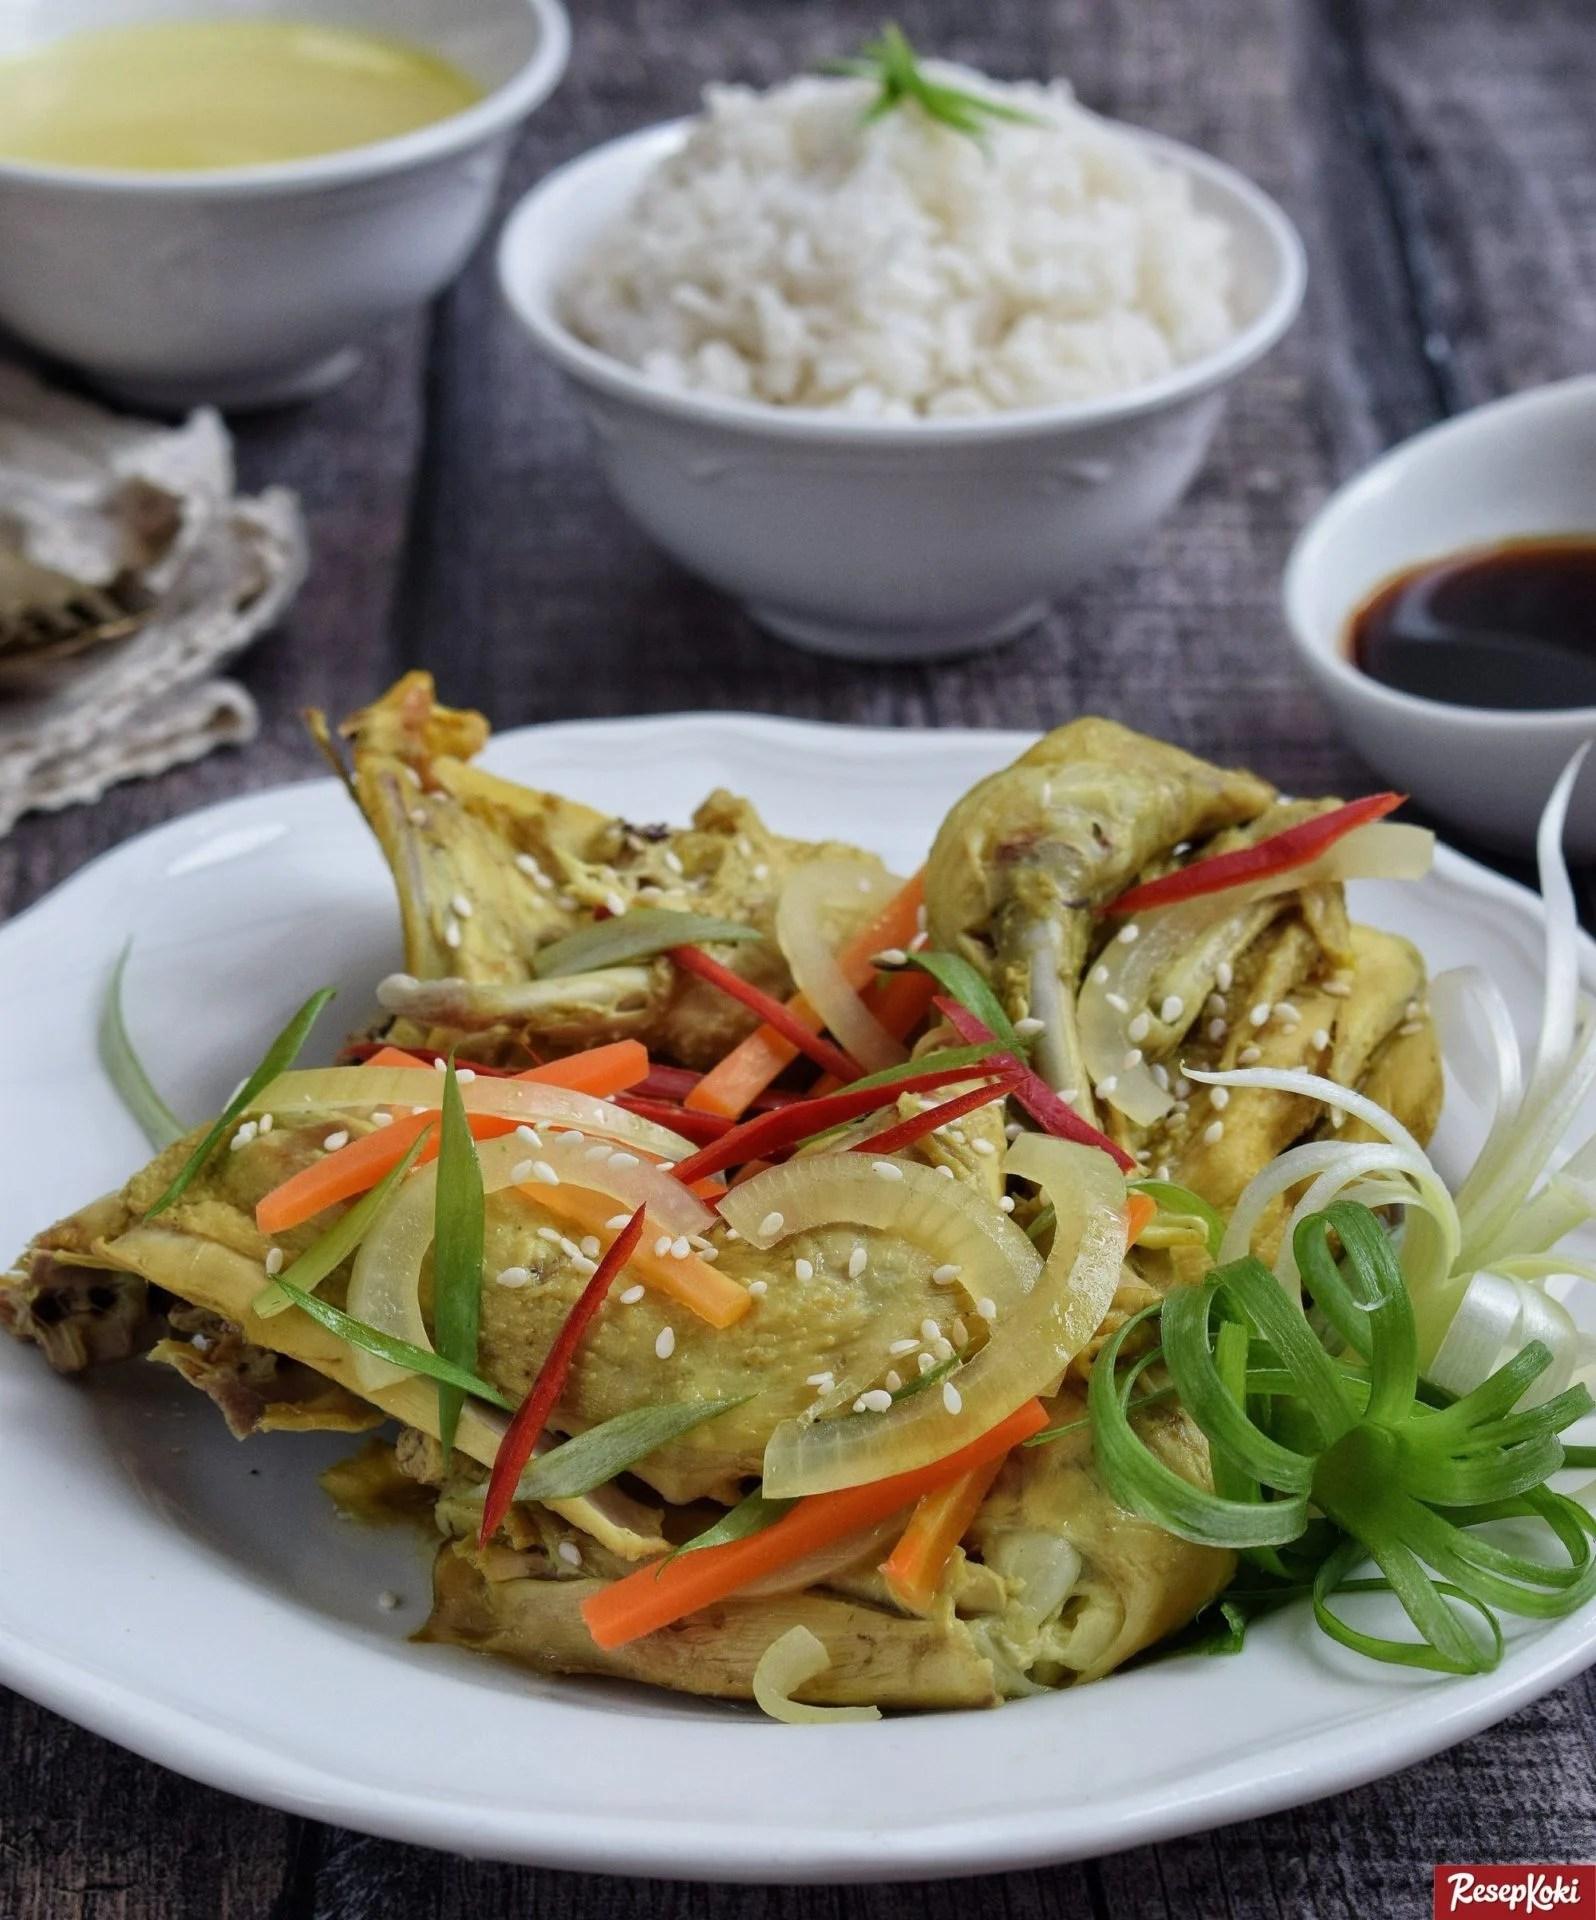 Resep Ayam Kukus : resep, kukus, Rebus, Simpel, Lezat, Berbumbu, Praktis, Resep, ResepKoki